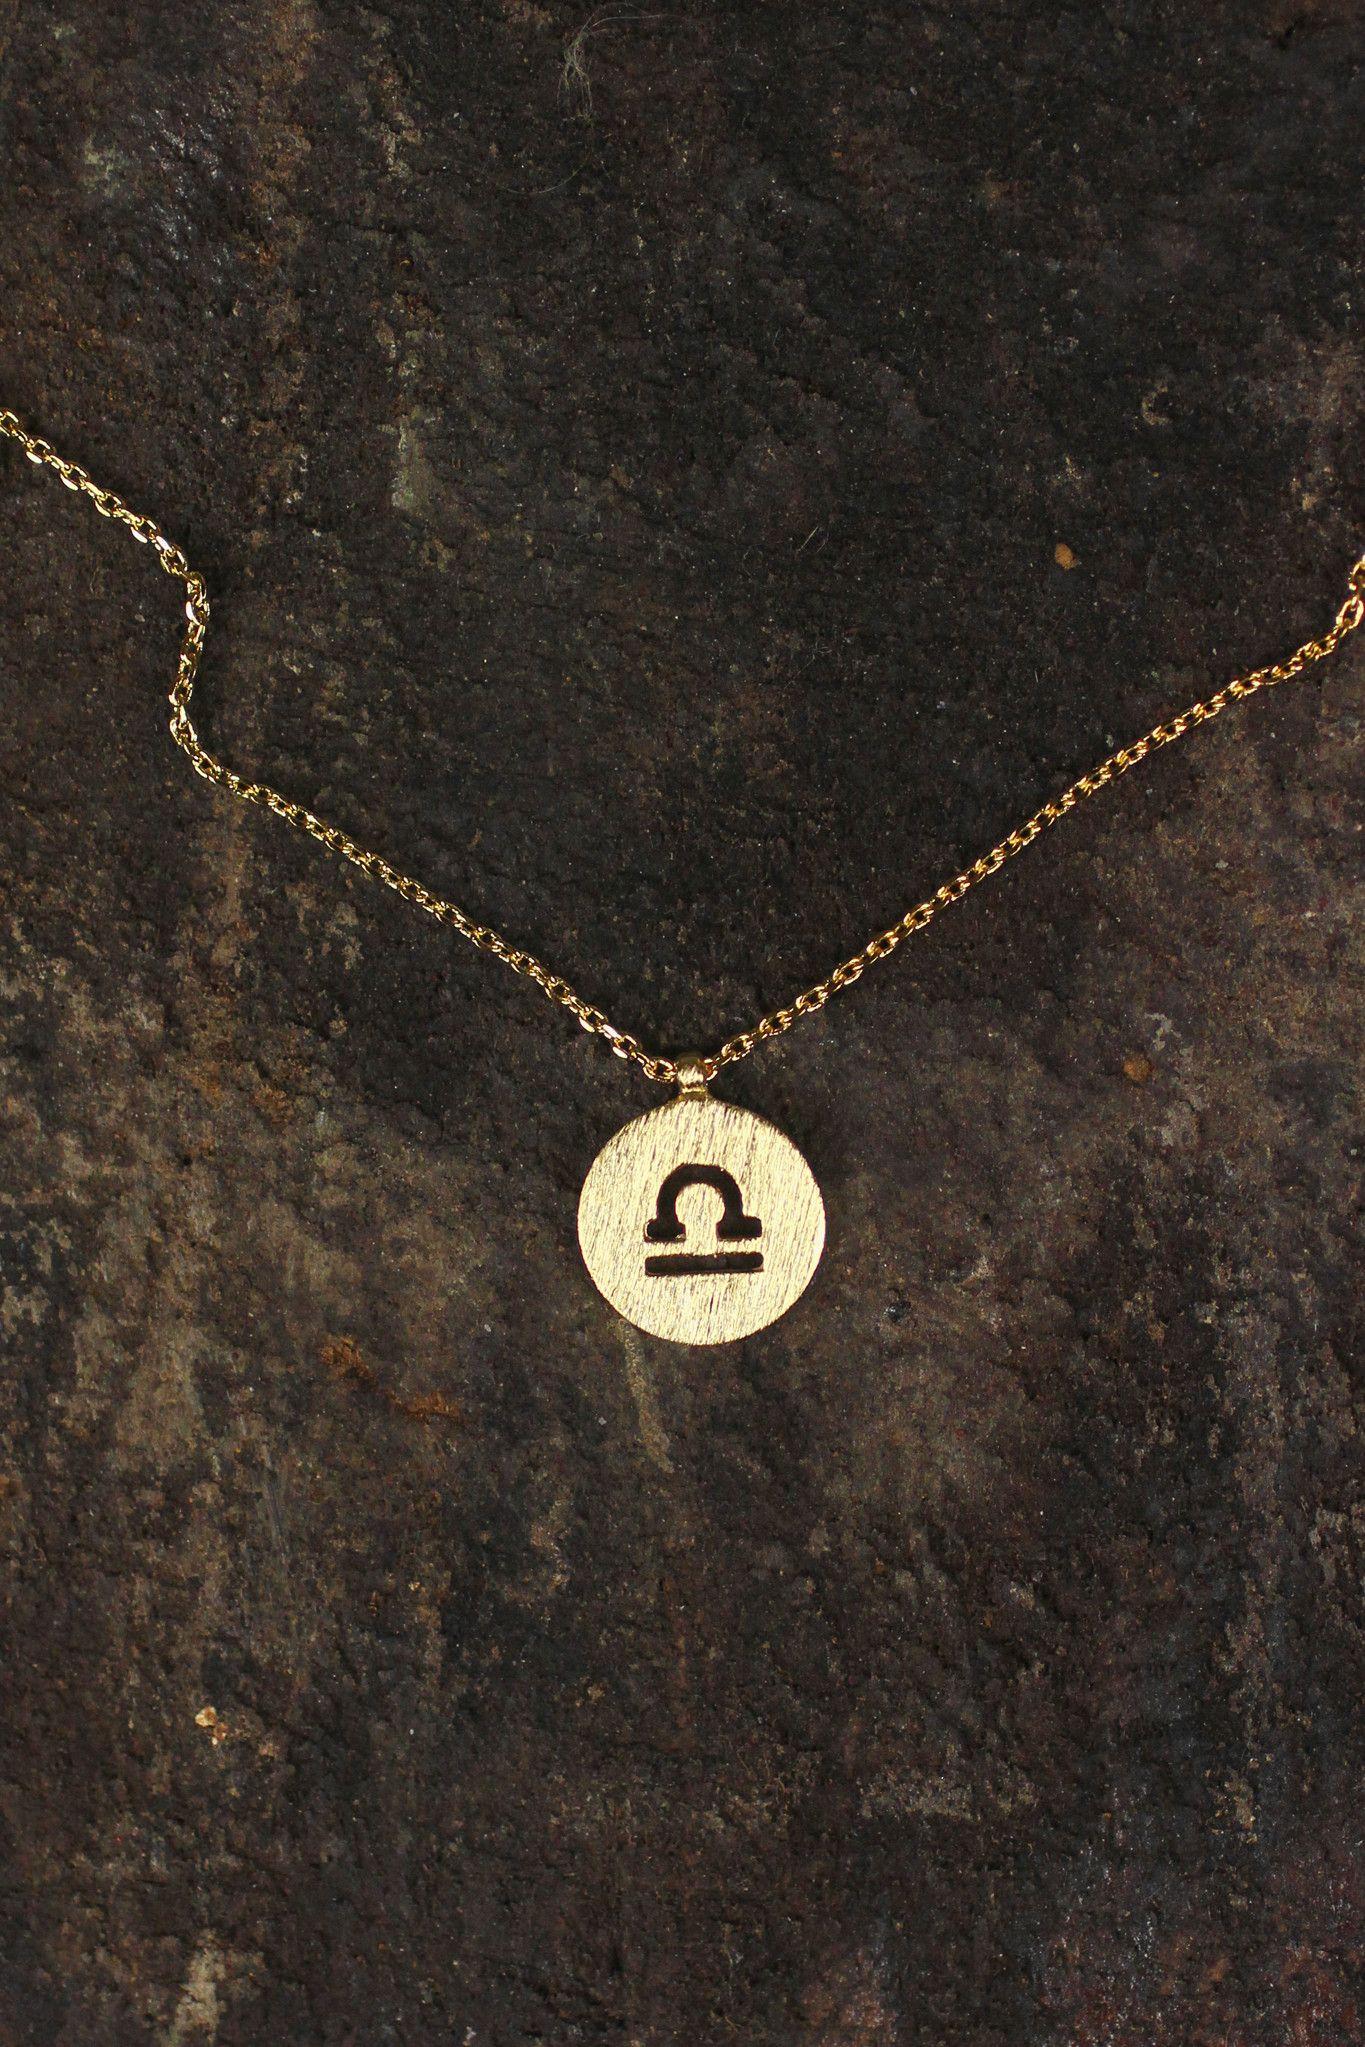 Libra charm necklace piercings u accessories pinterest